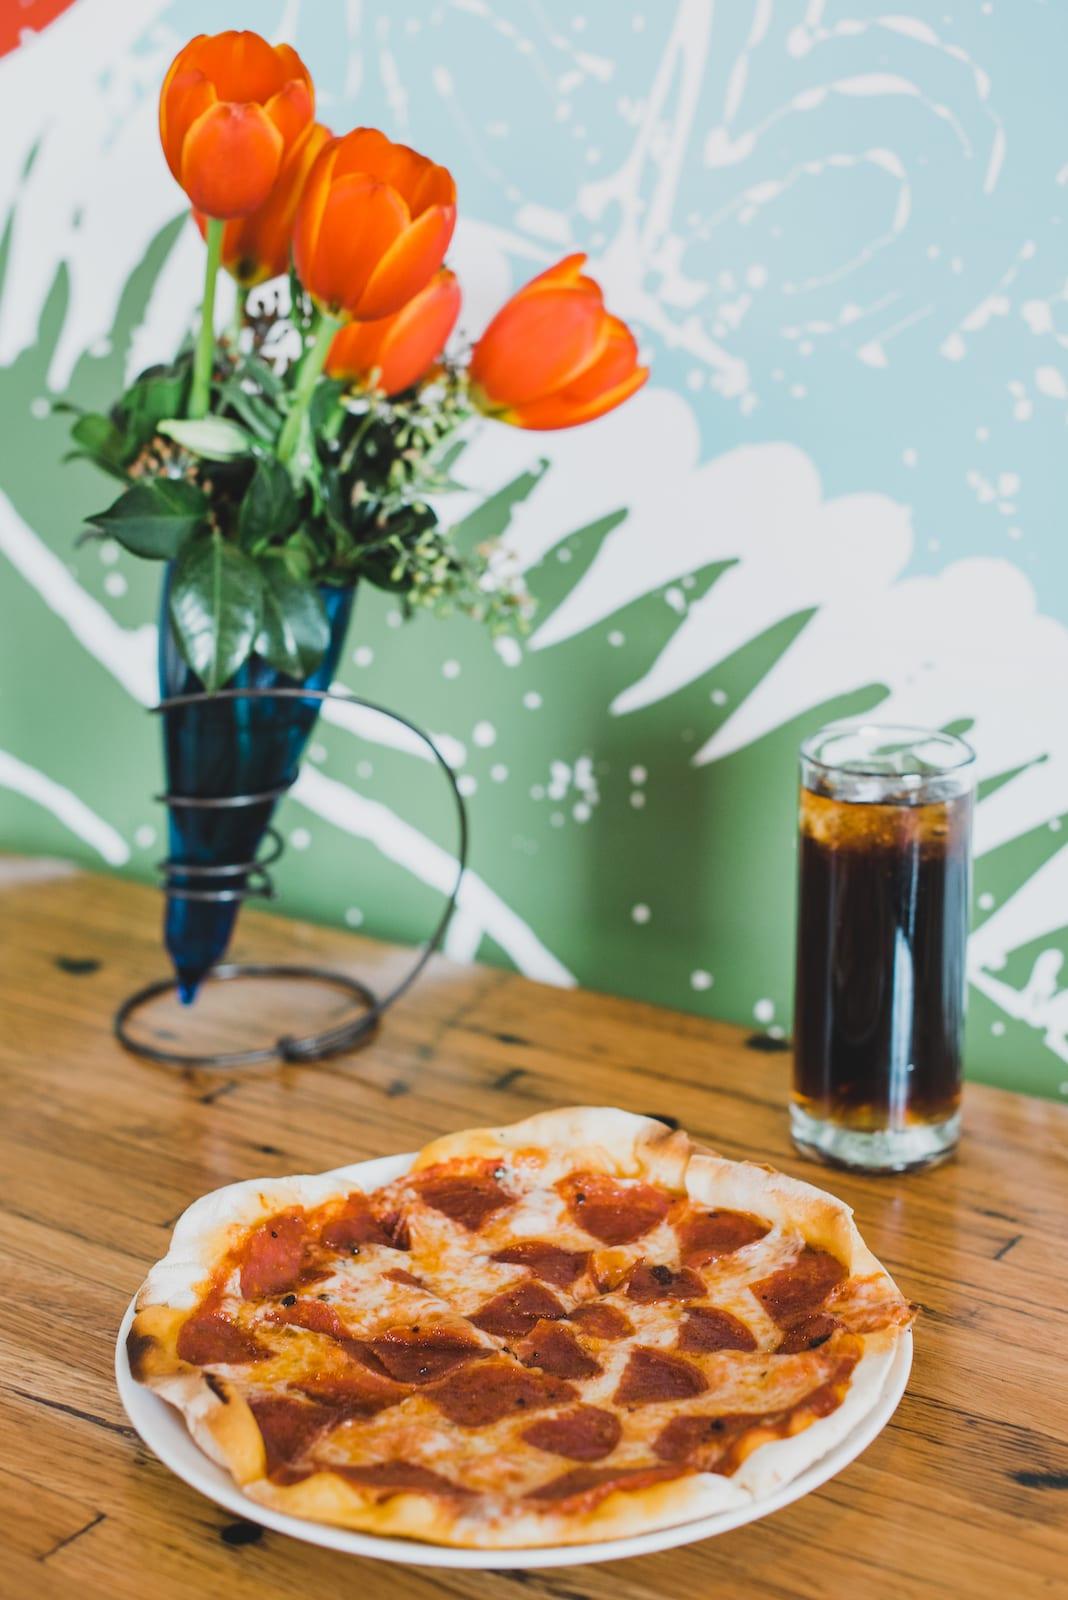 Pizza | Food Photography | Sazza Restaurant | From the Hip Photo